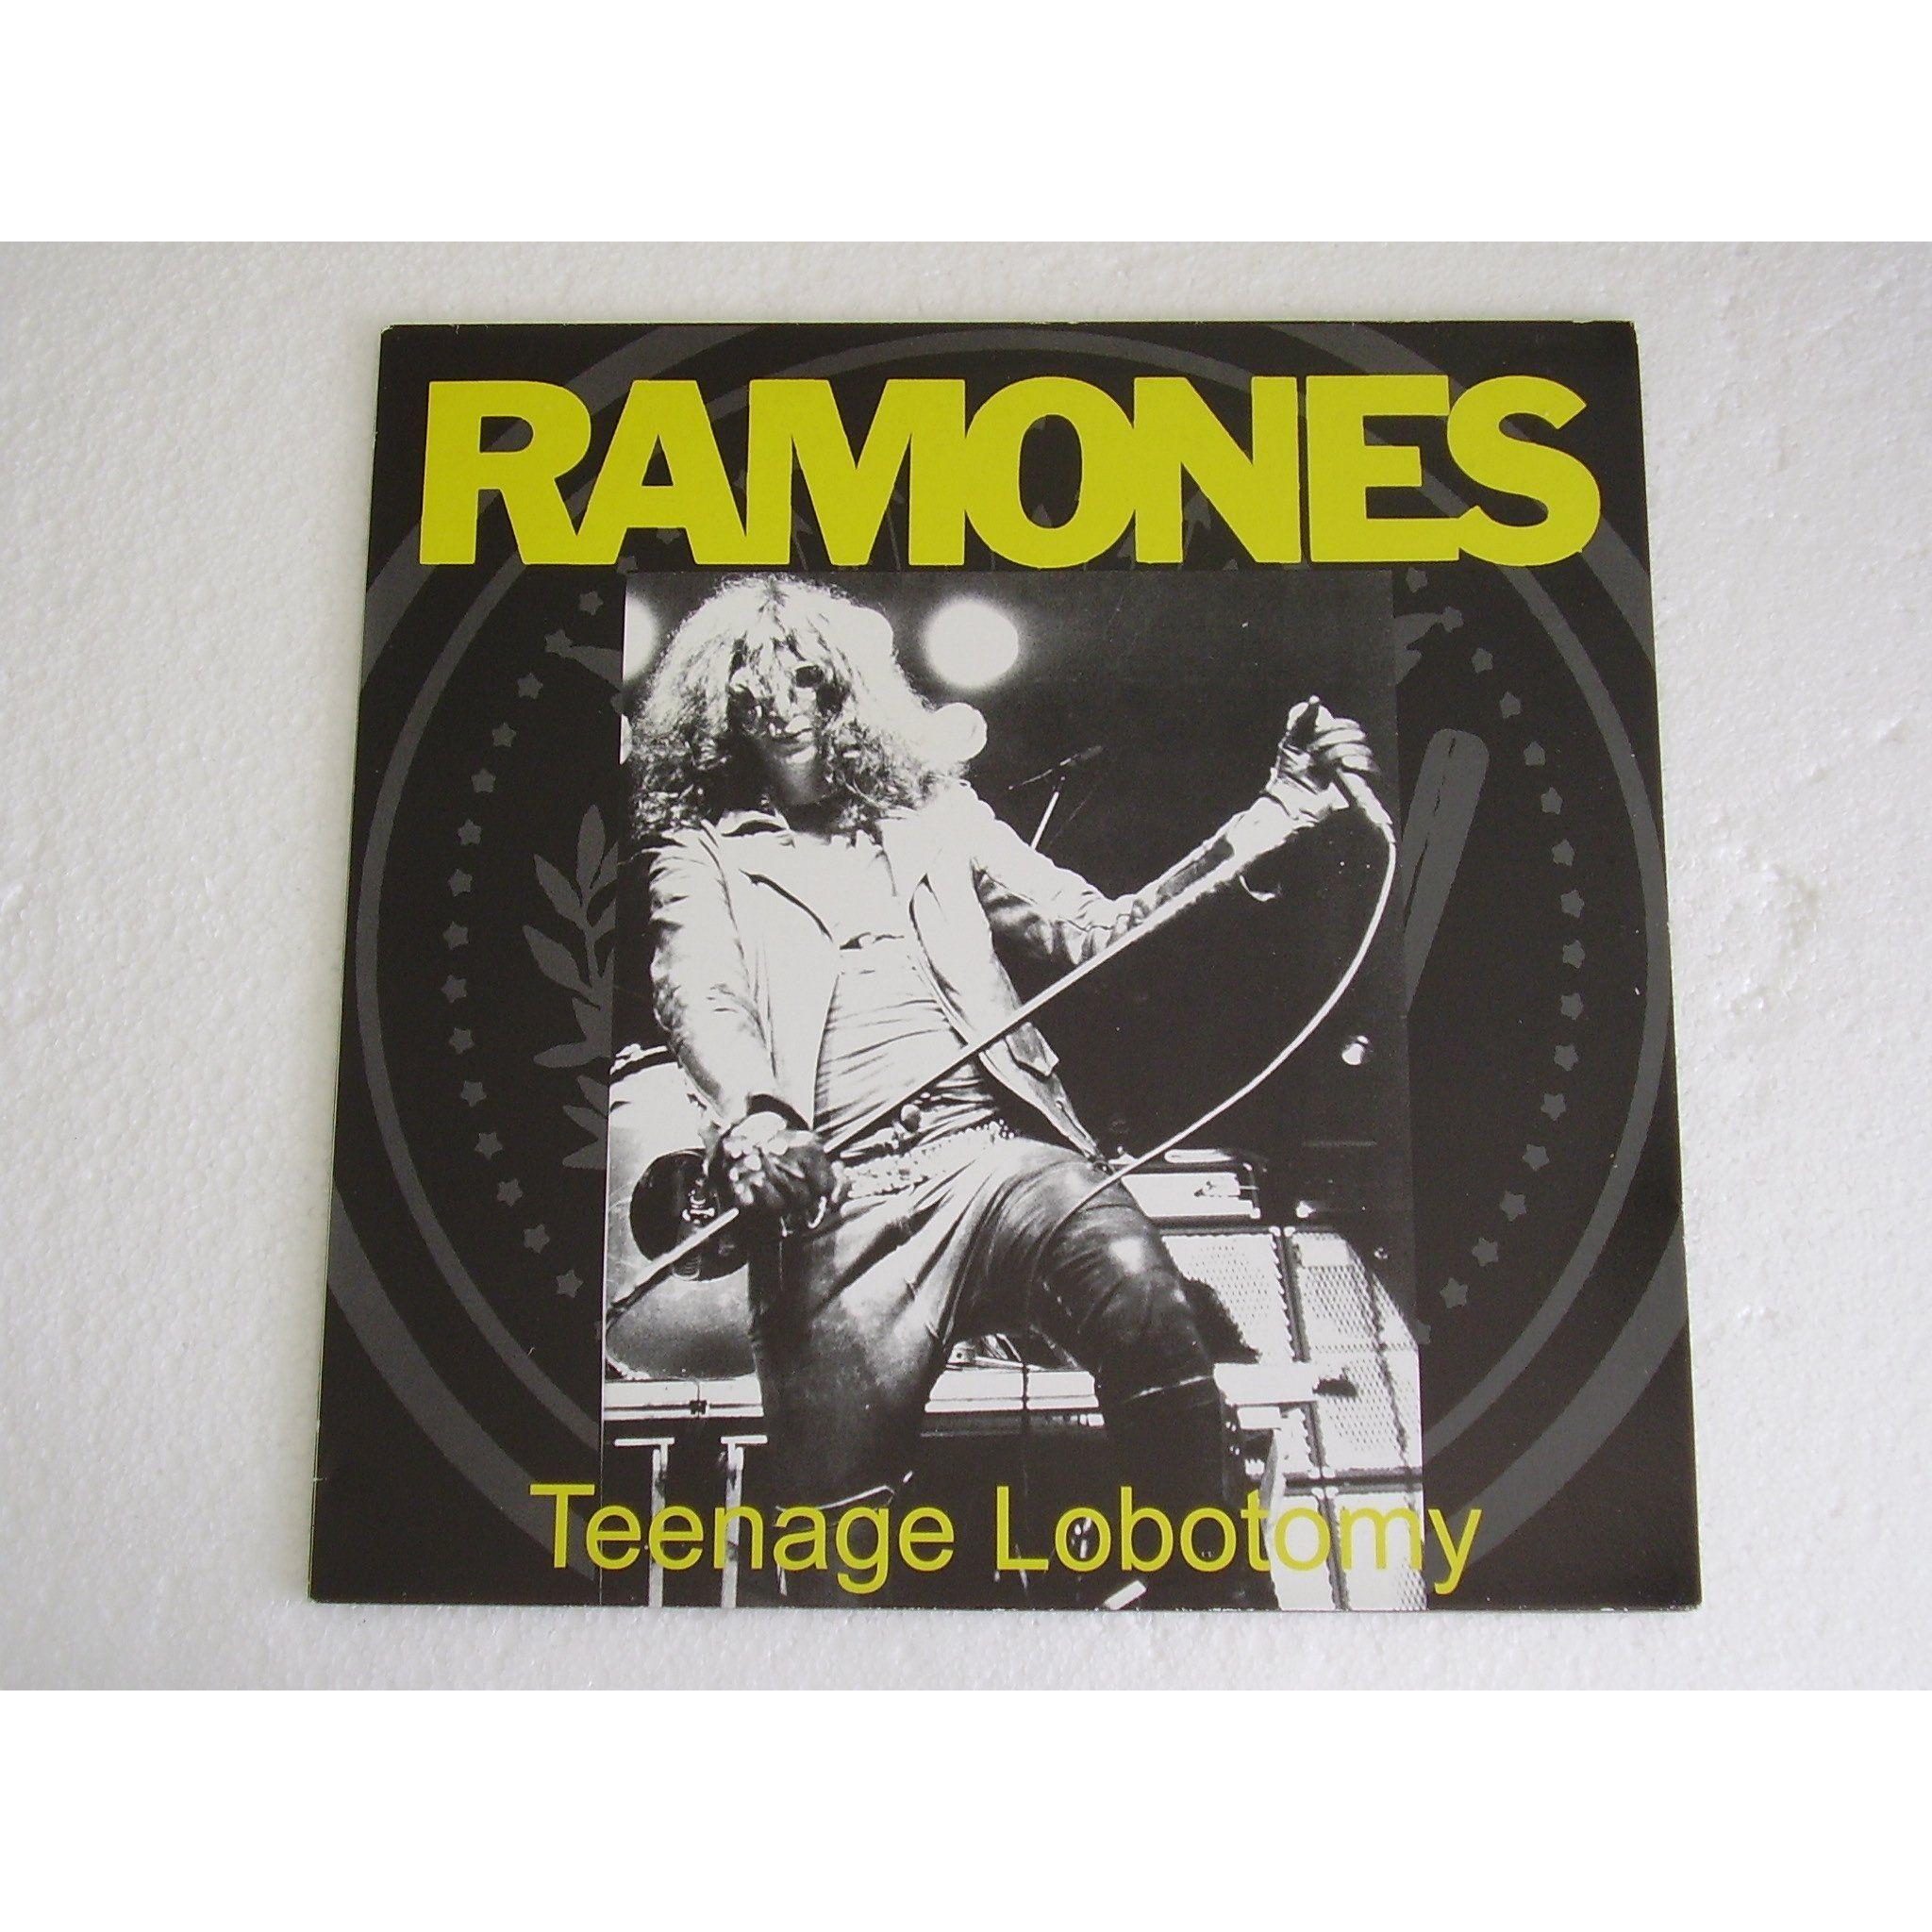 Ramones – Teenage Lobotomy (single cover art)